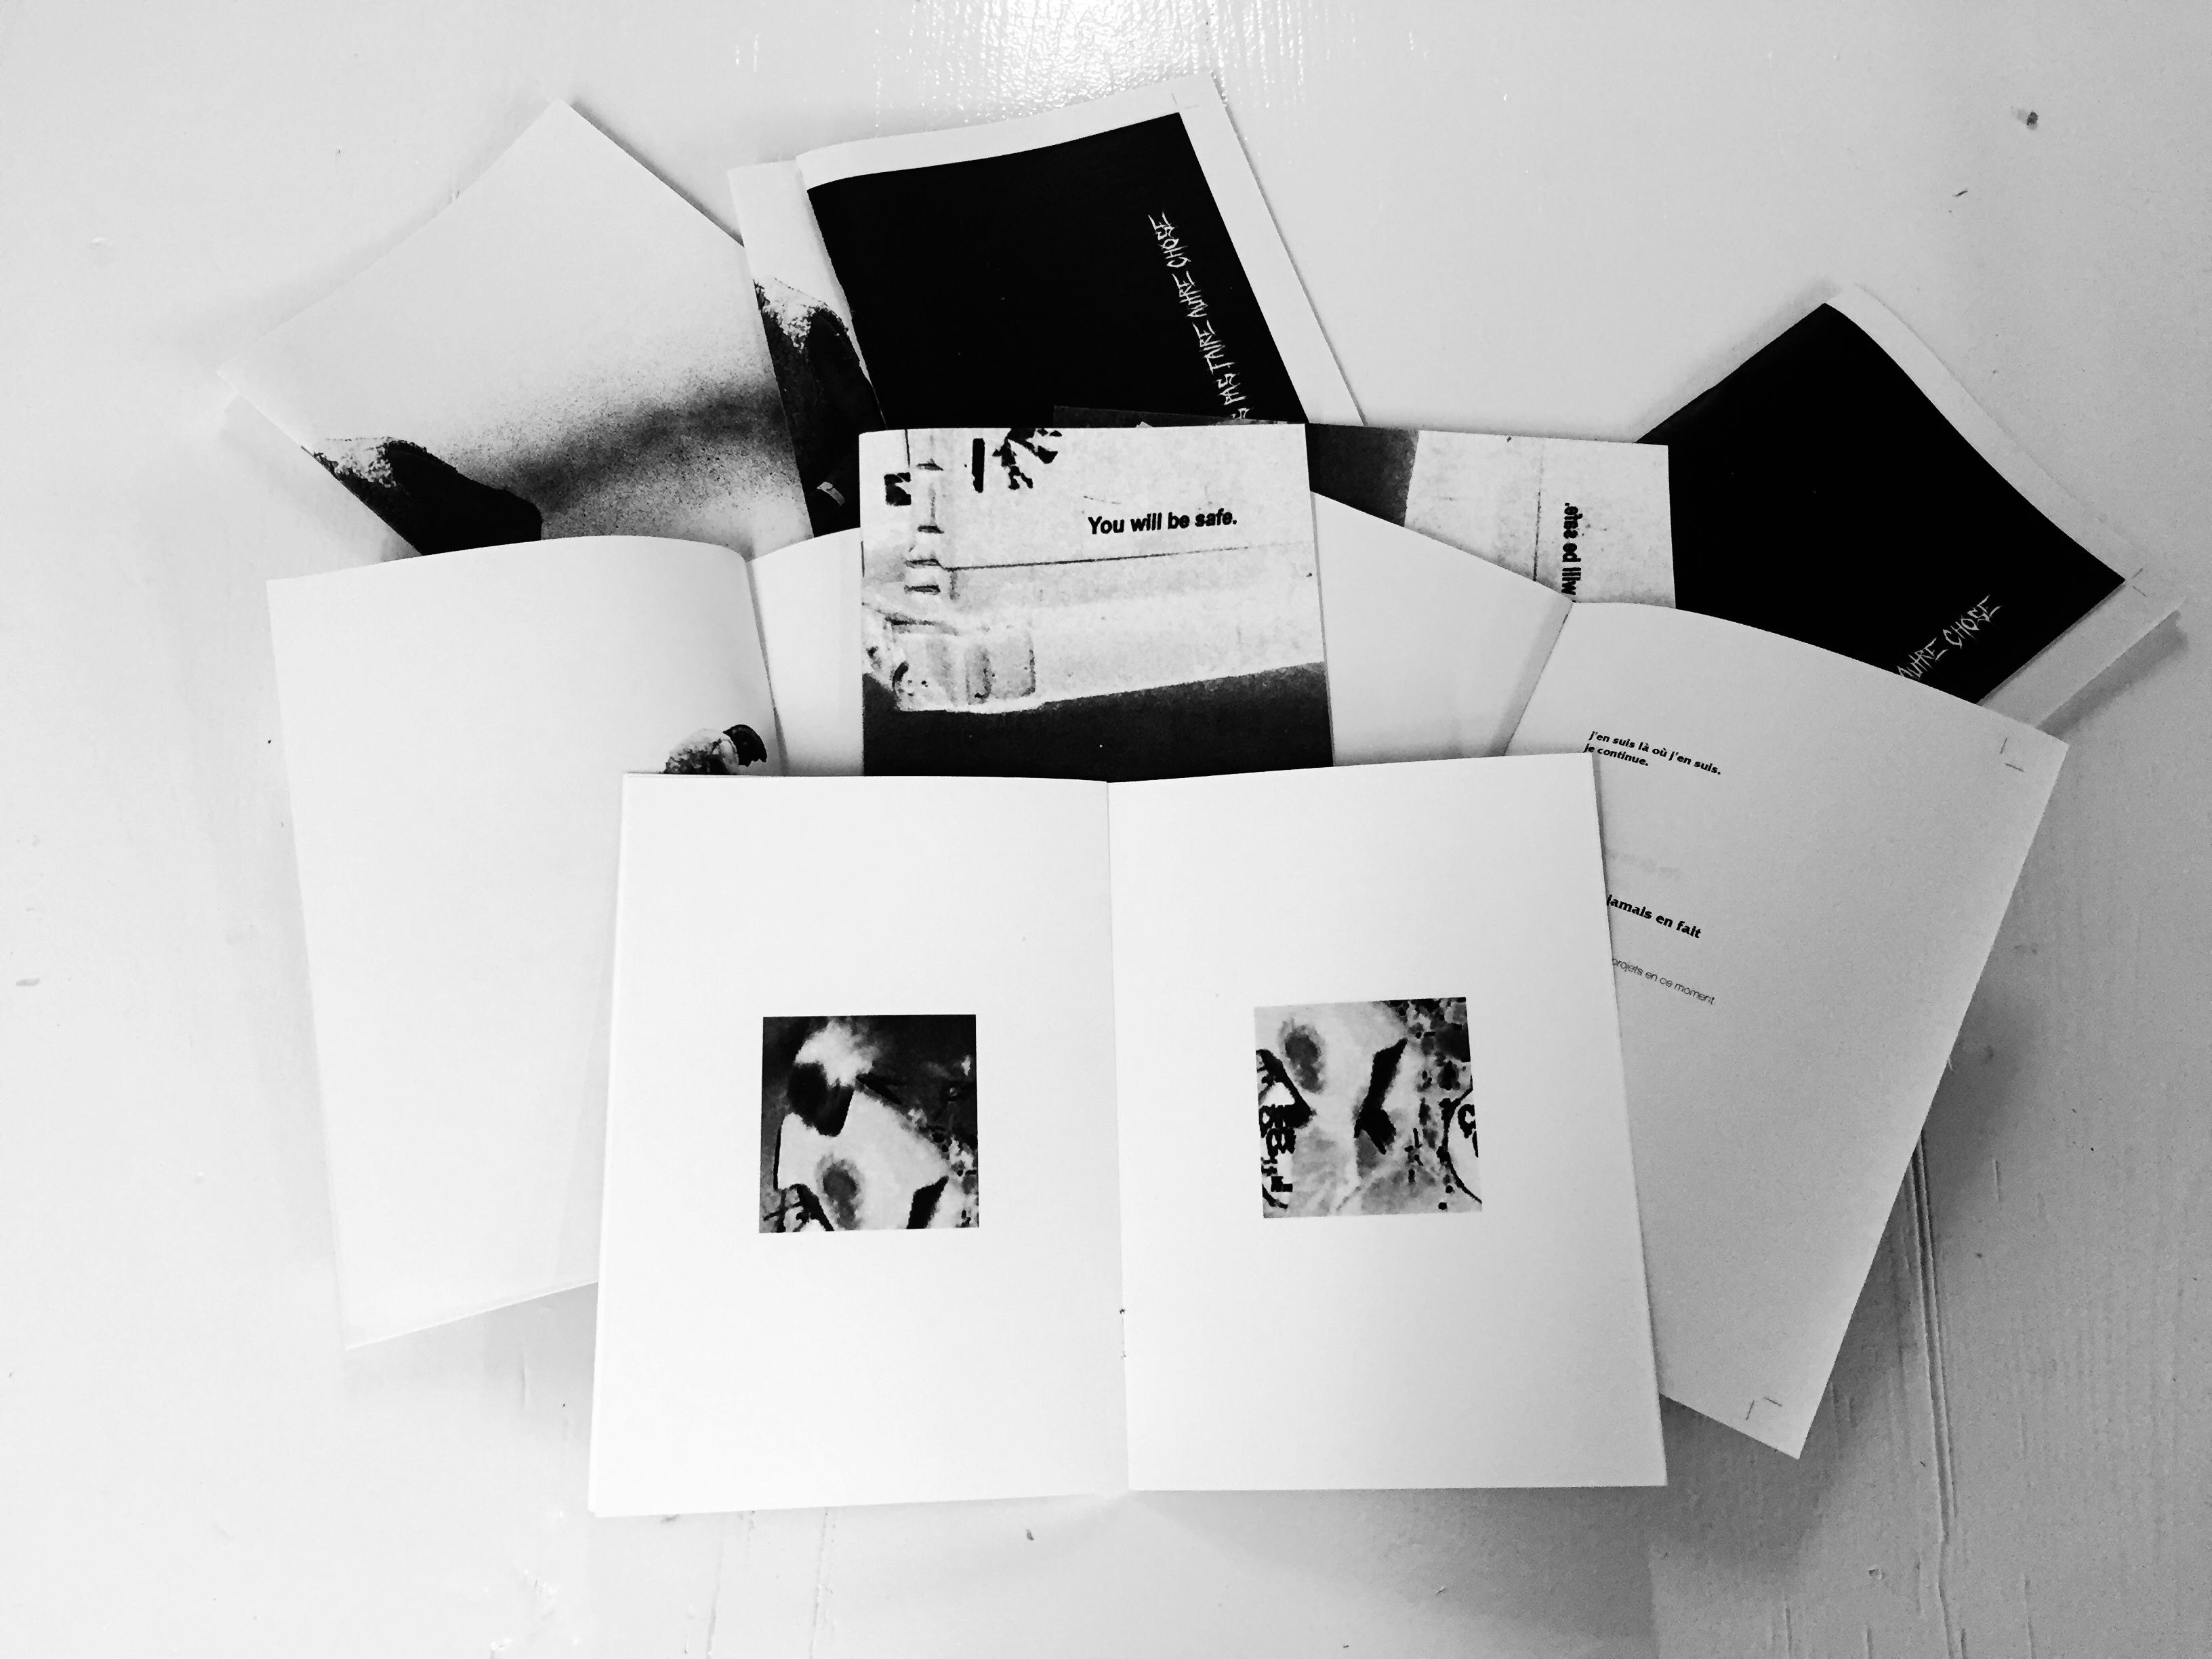 Editions de fanzines